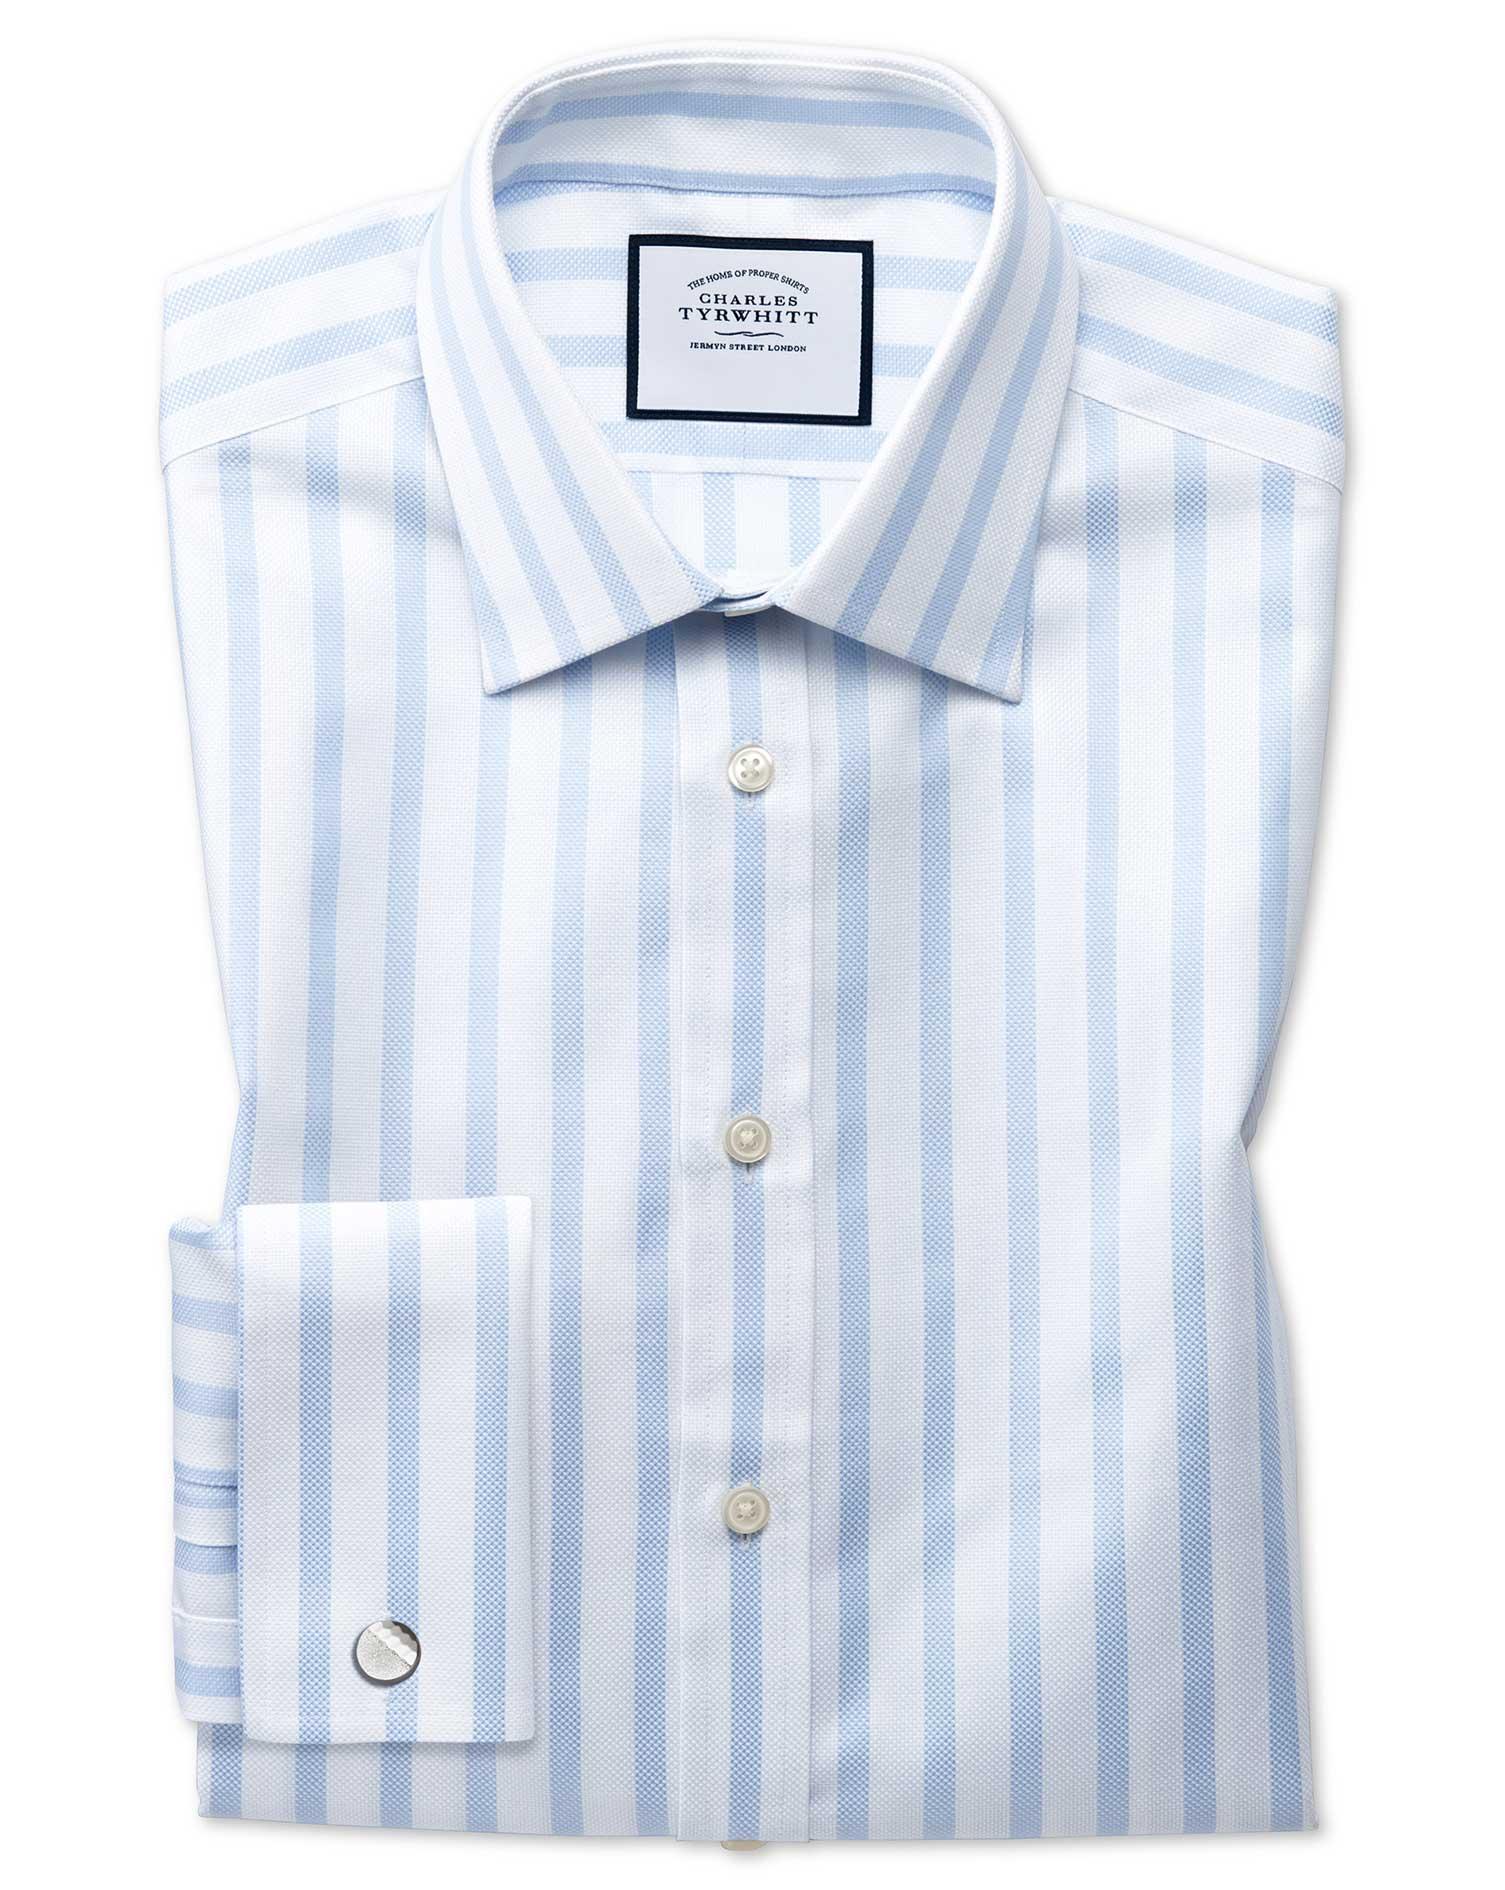 Slim Fit Egyptian Cotton Royal Oxford Sky Blue Stripe Formal Shirt Single Cuff Size 15.5/35 by Charl